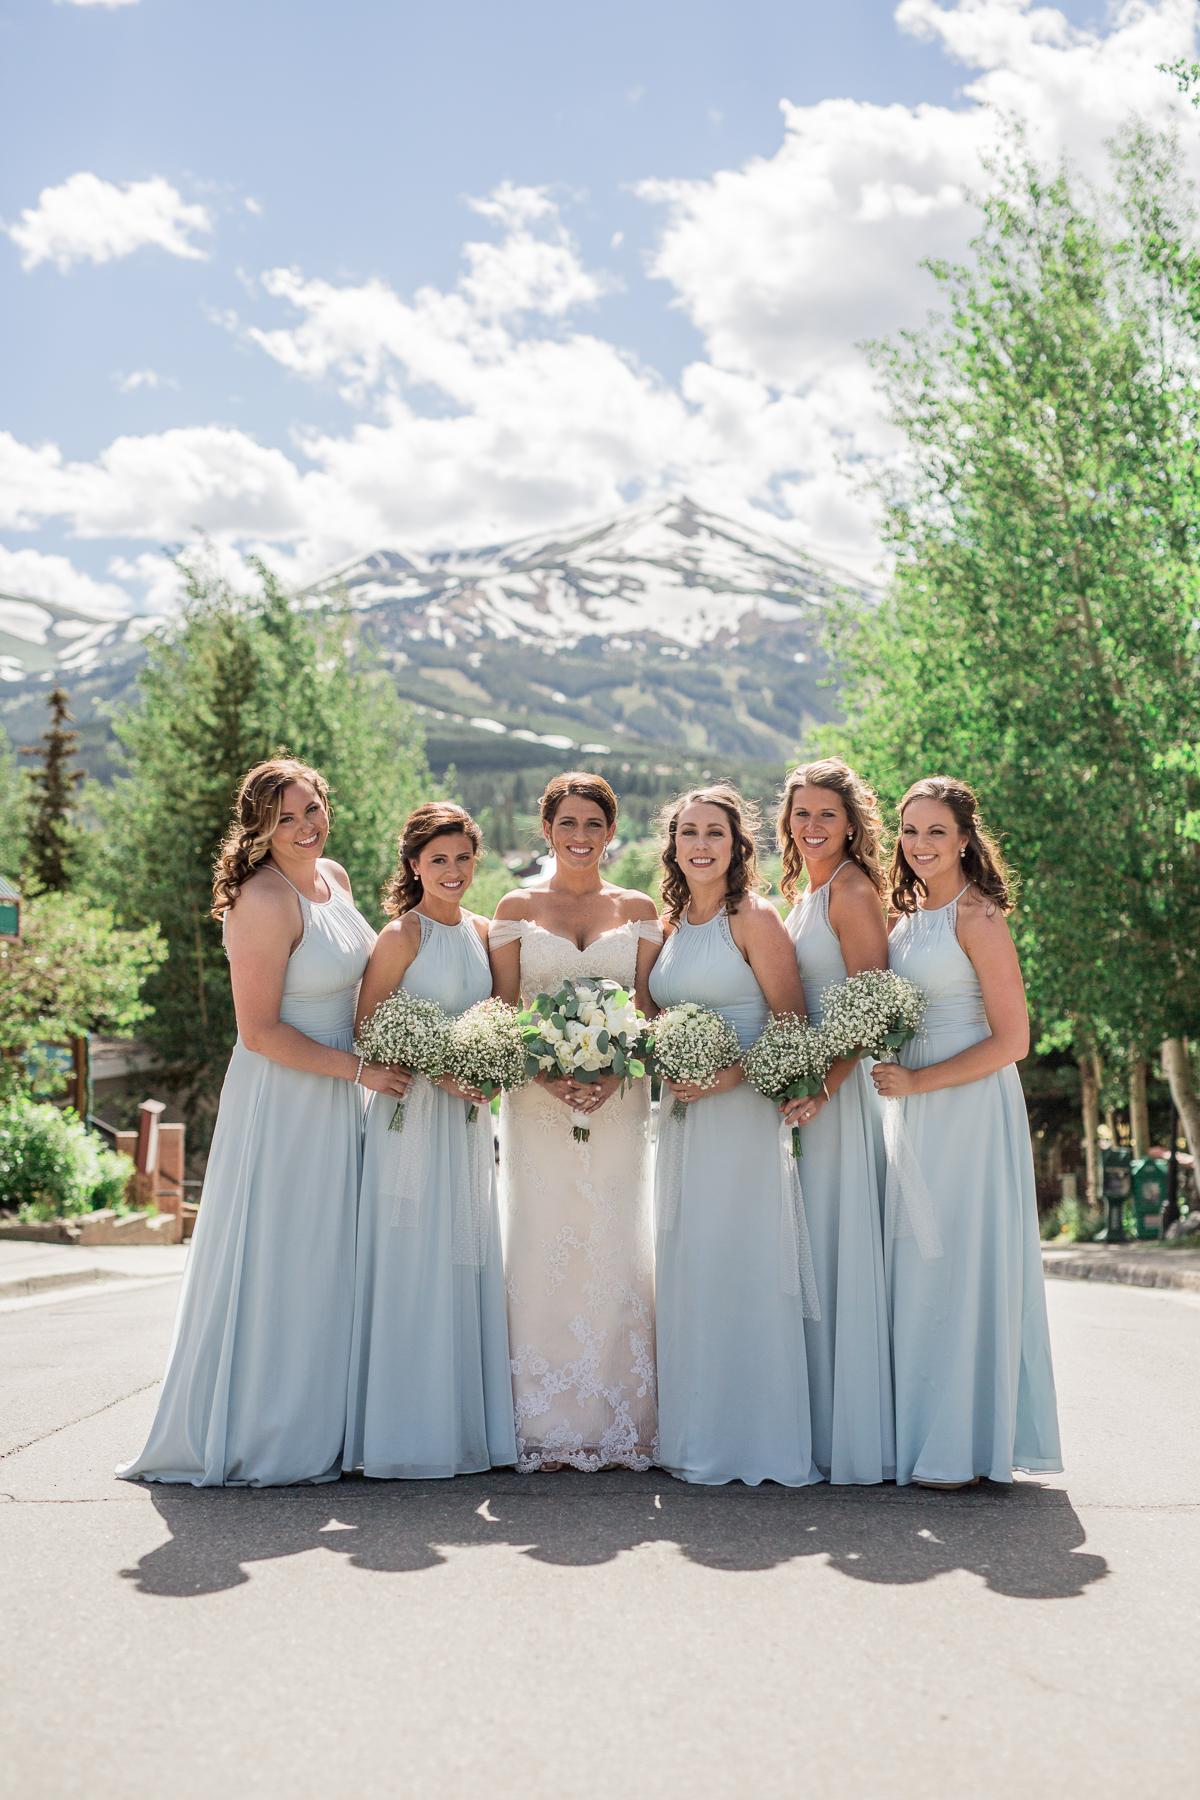 StaciDesign-Colorado-Wedding-4736.jpg